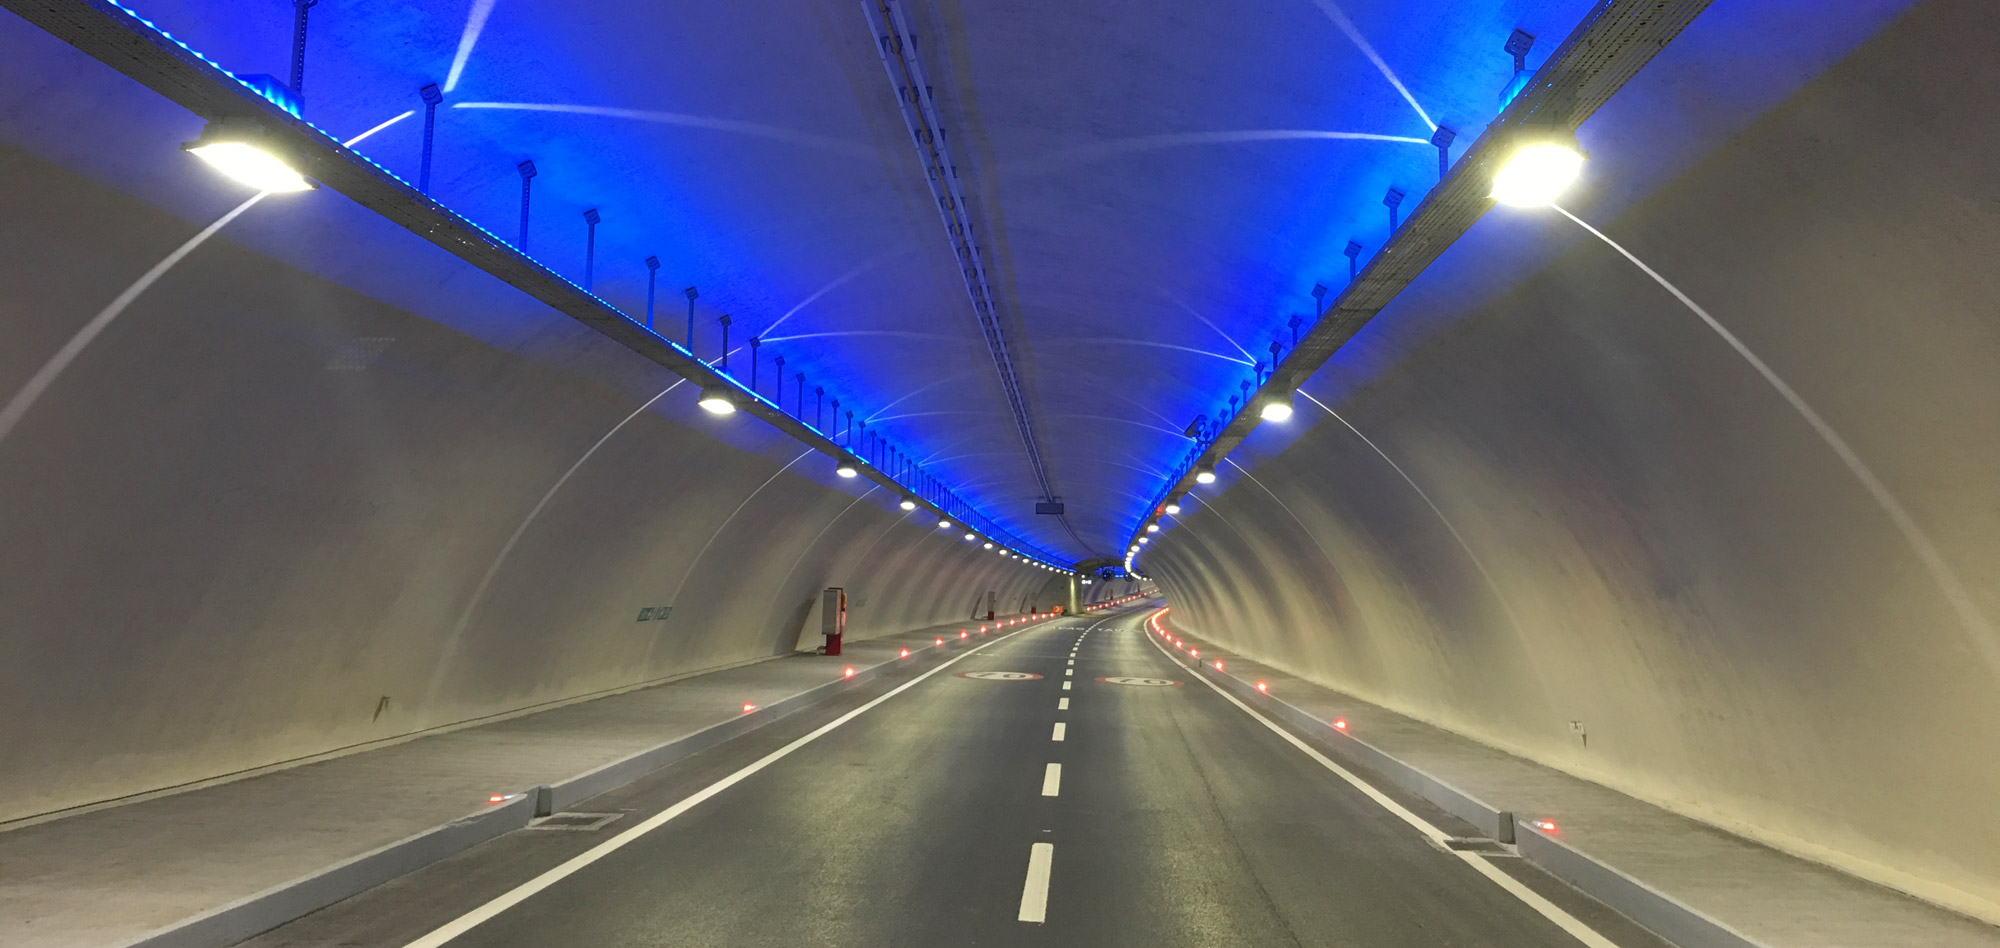 Eurasia Tunnel inaugurated in Istanbul